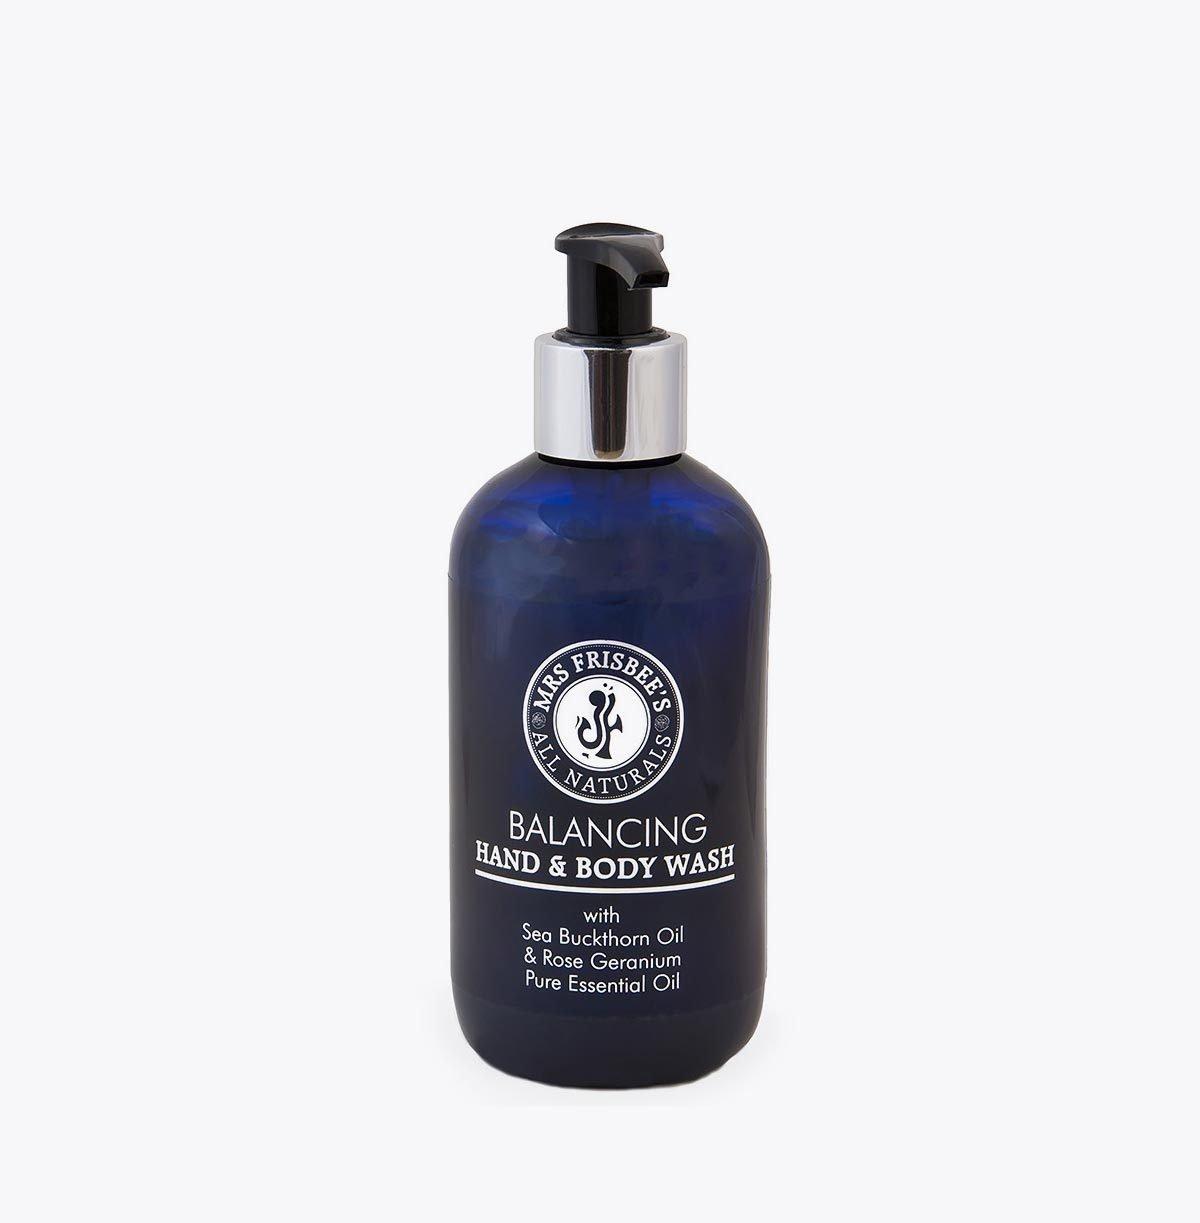 Rose Geranium Hand and Body Wash with aloe vera, sea buckthorn and rose geranium pure essential oil.